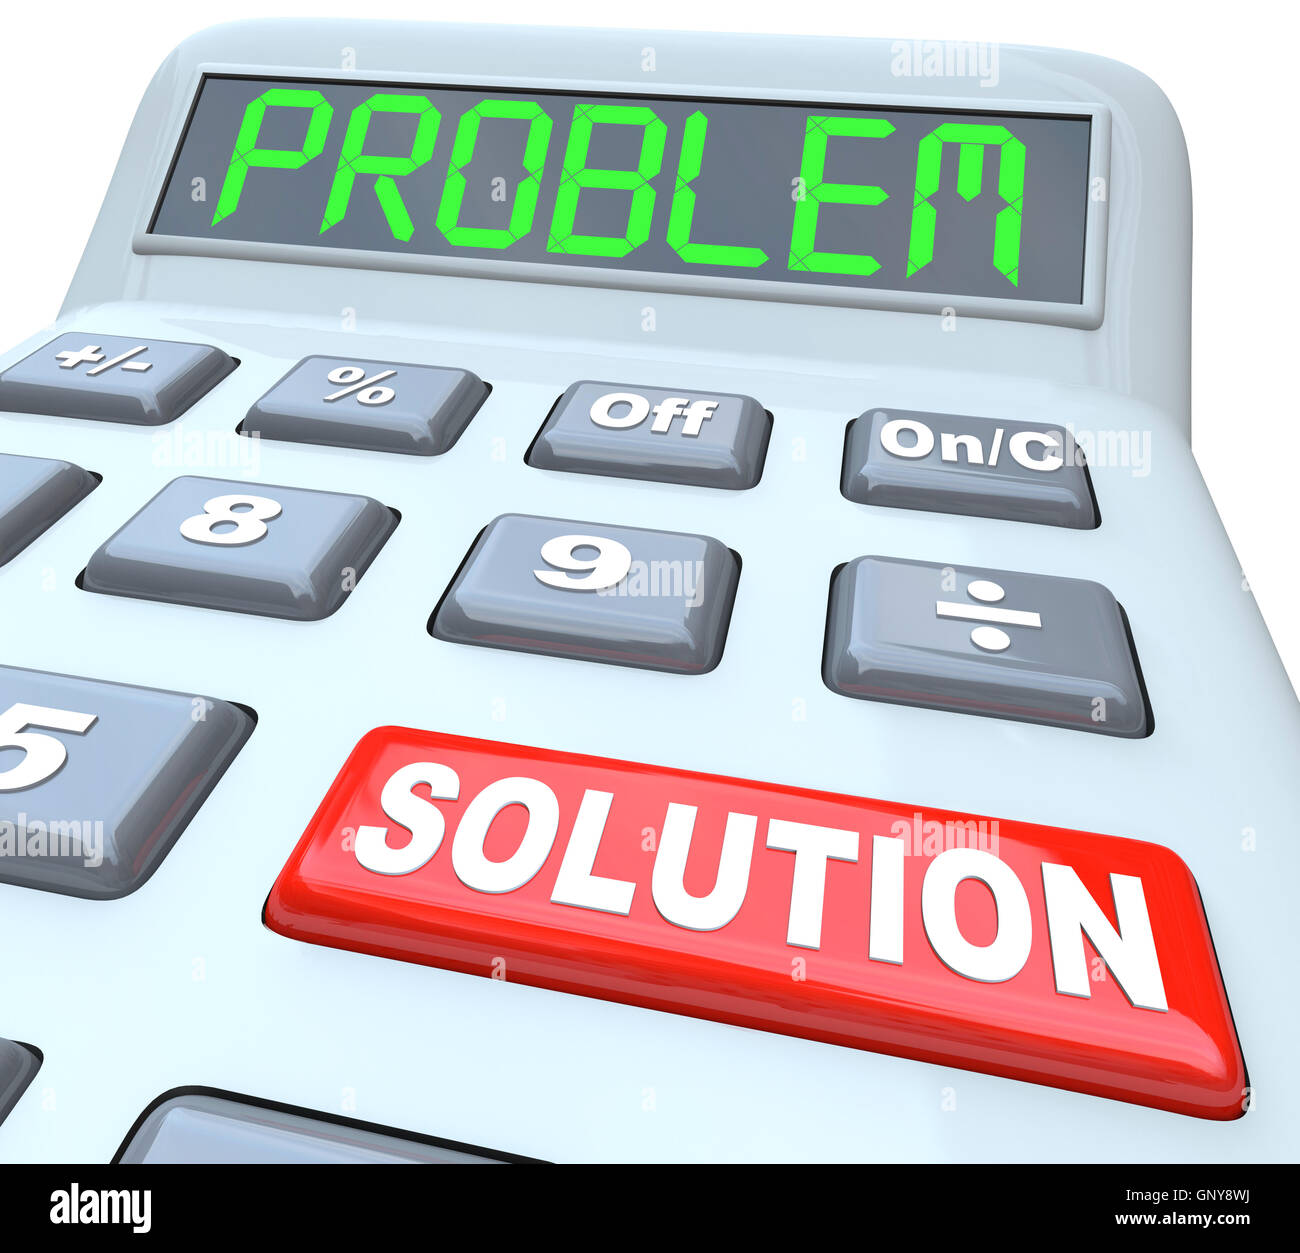 Difficult Math Problem Stock Photos Amp Difficult Math Problem Stock Images